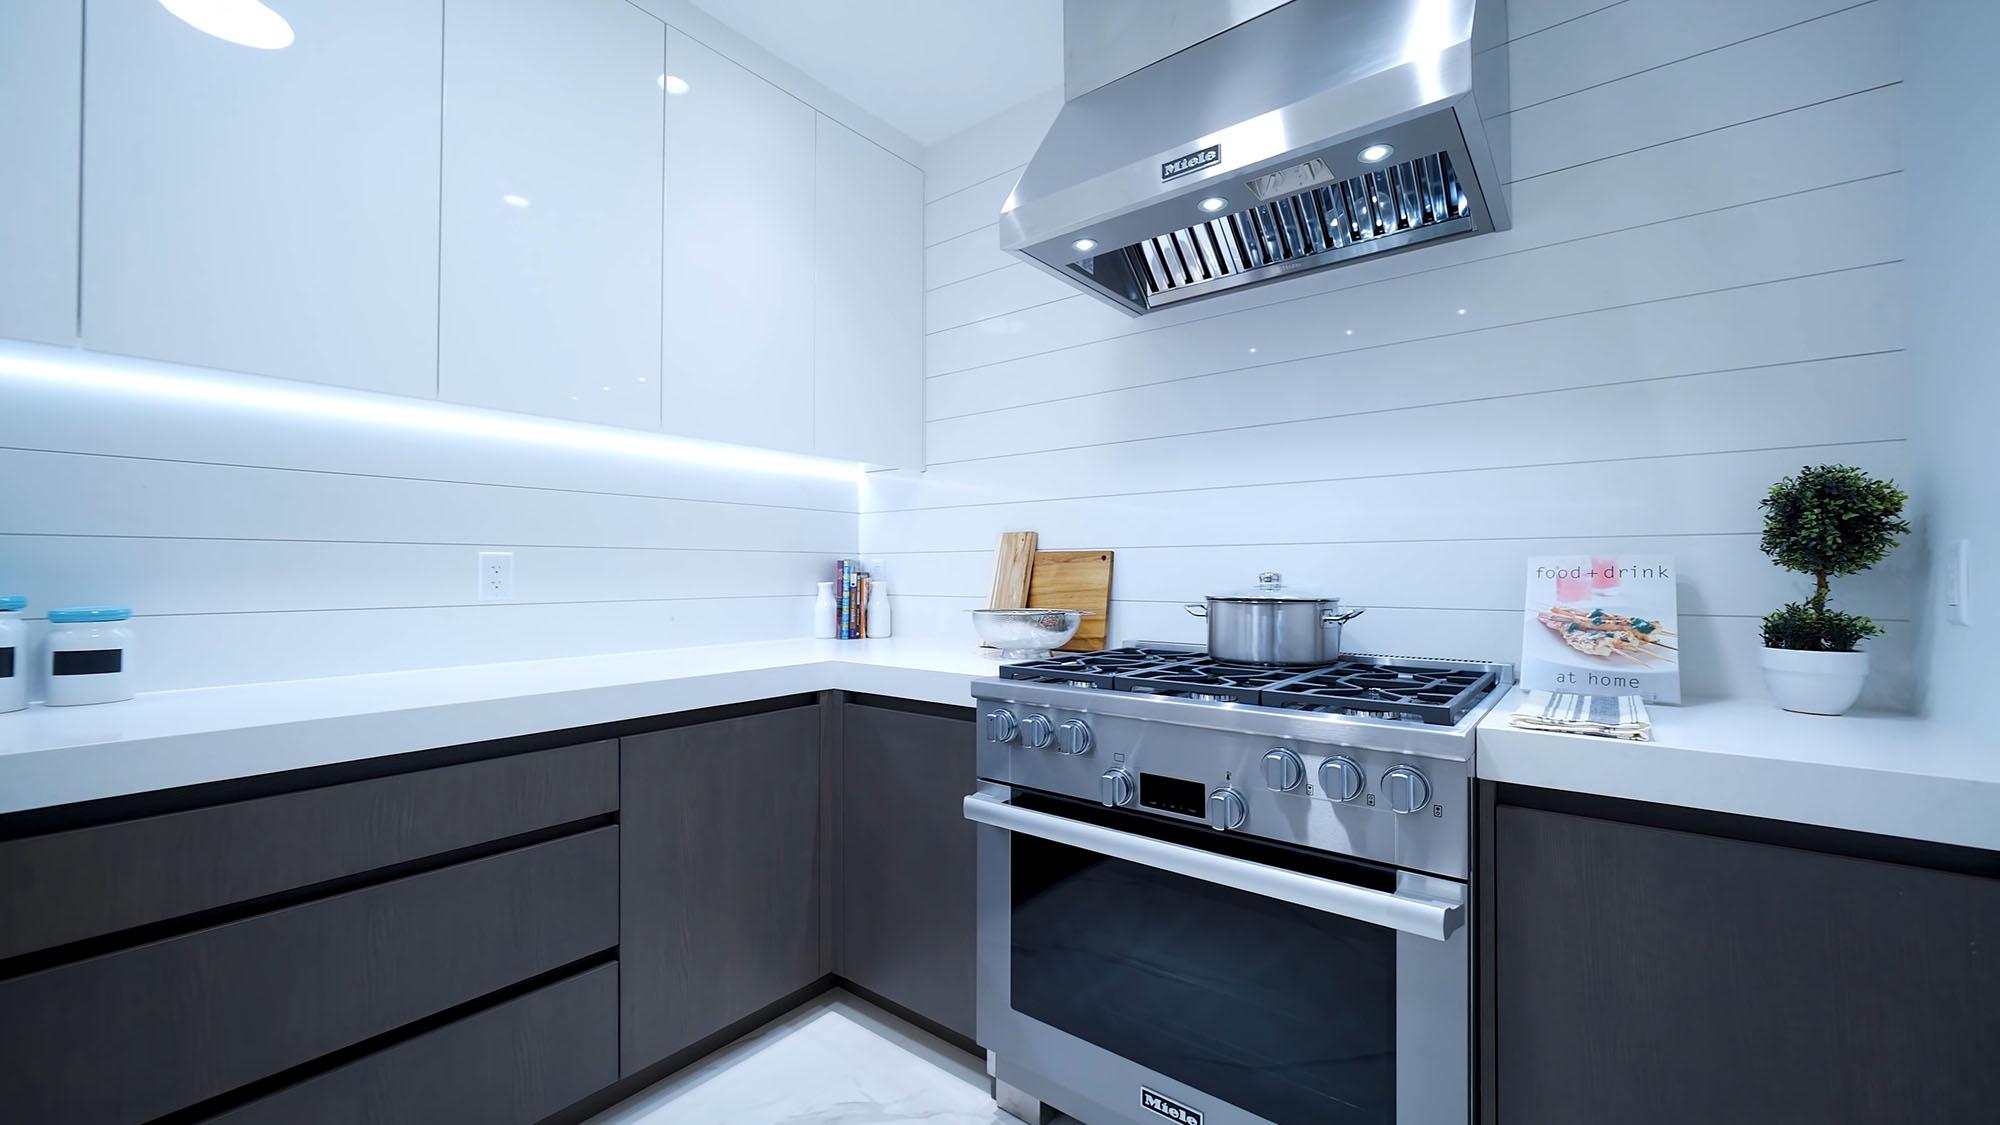 Miele full size range in an ultra modern prep kitchen.